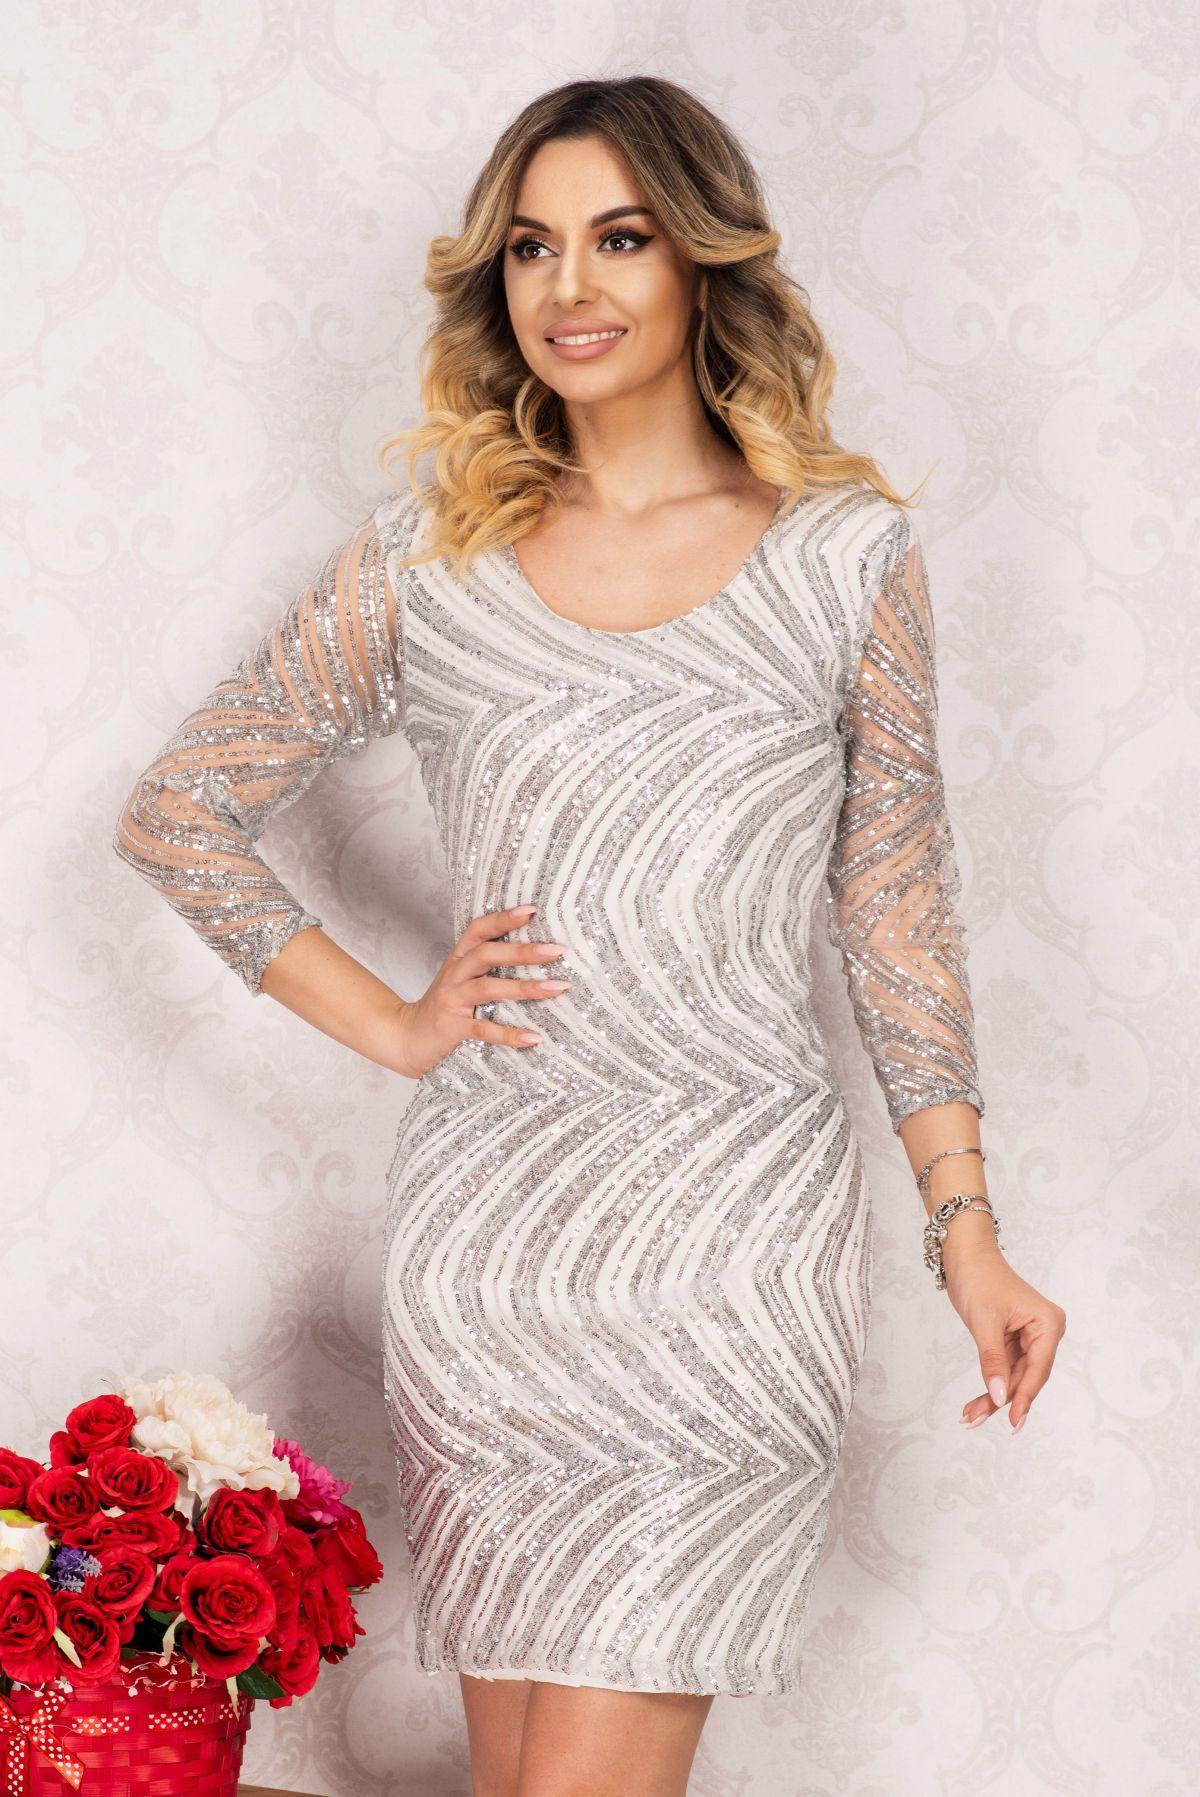 Rochie de ocazie eleganta Irene gri conica cu paiete argintii By InPuff